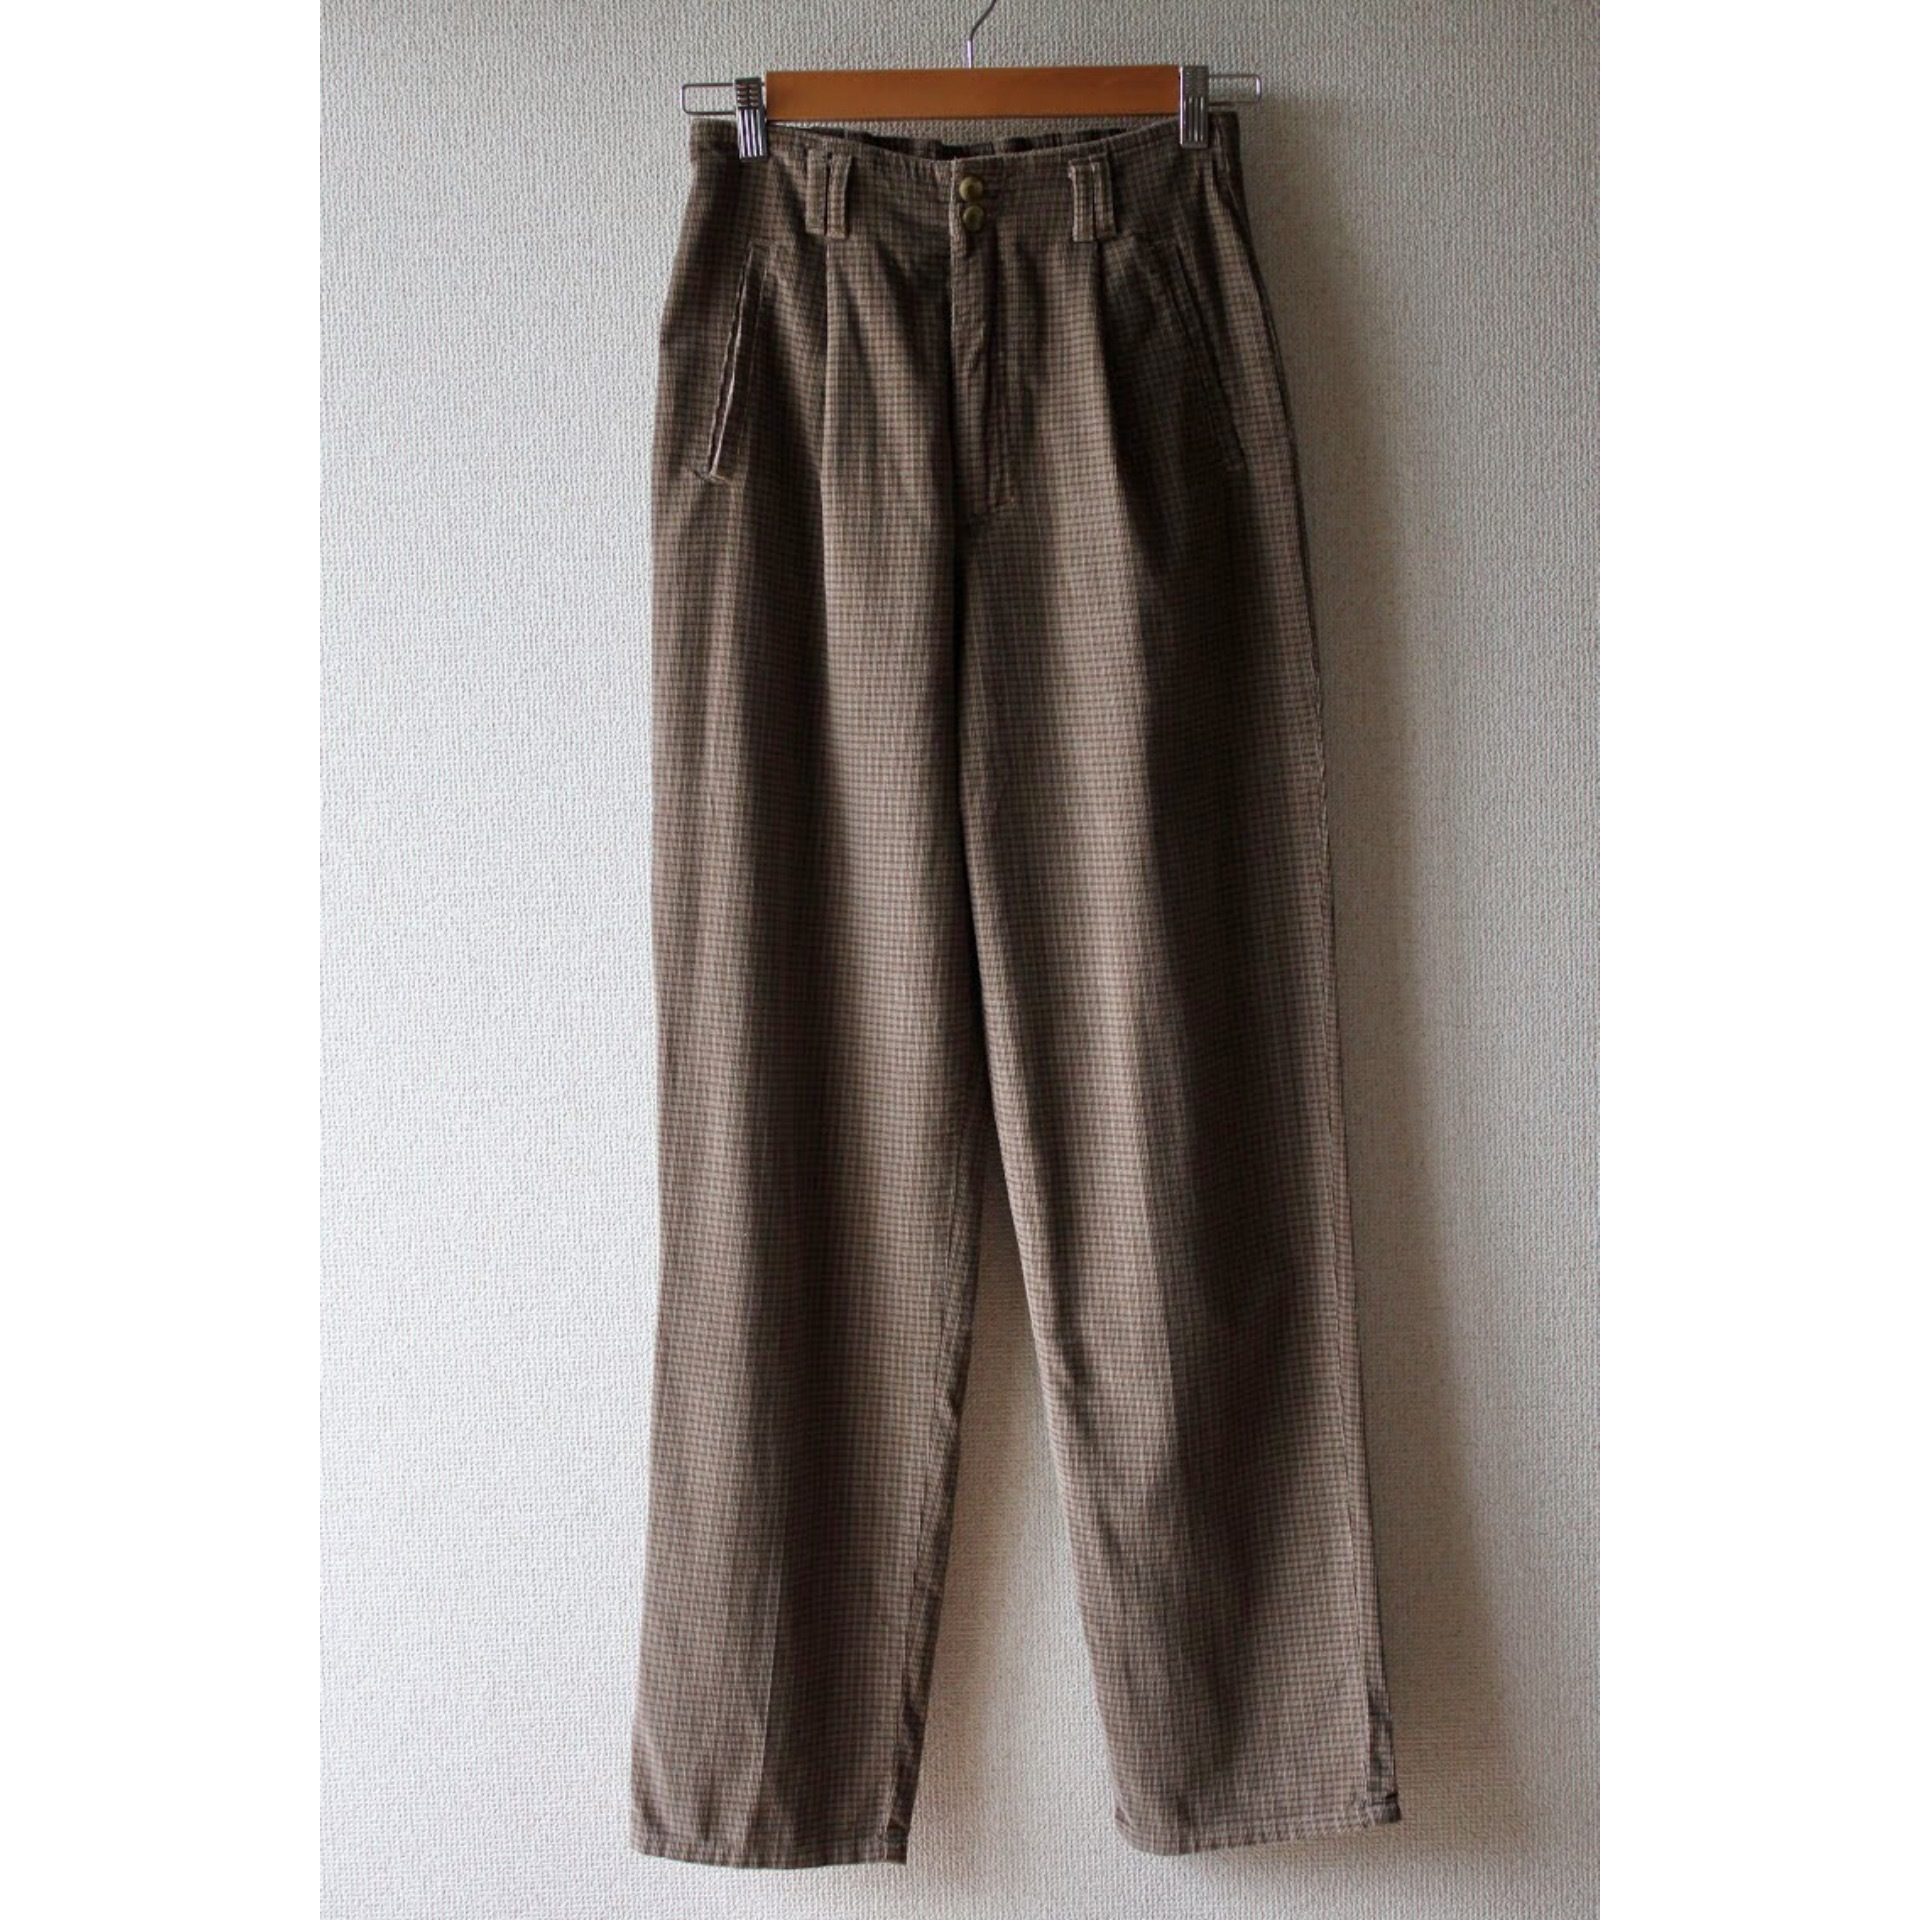 Vintage check corduroy pants